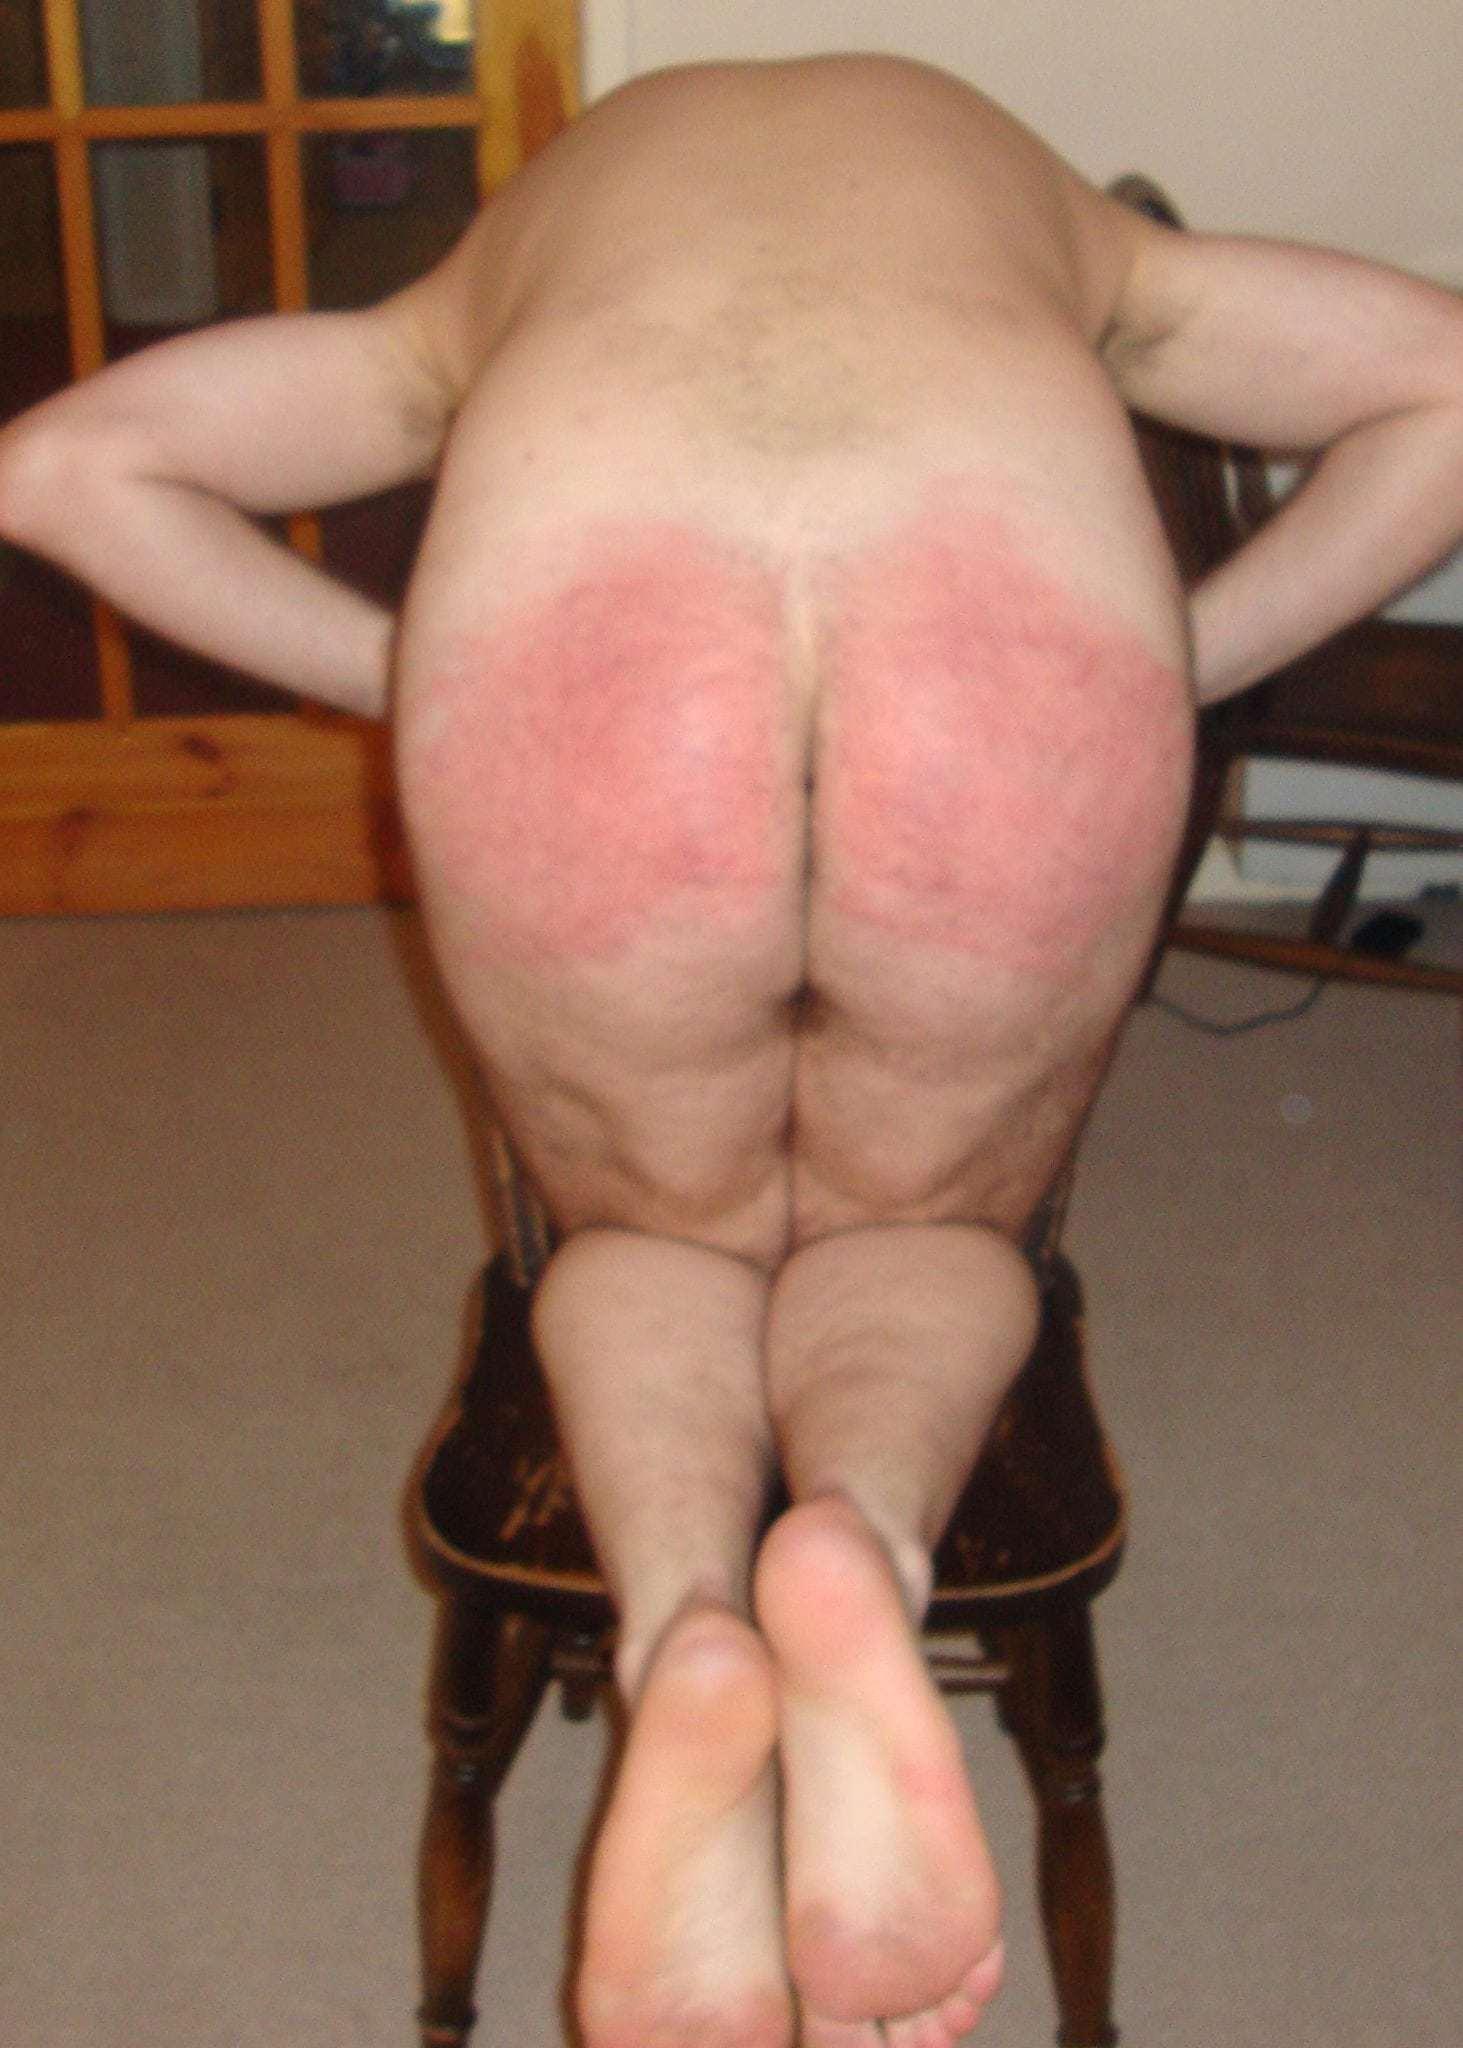 spanking cams, red bottom cam, spank cams